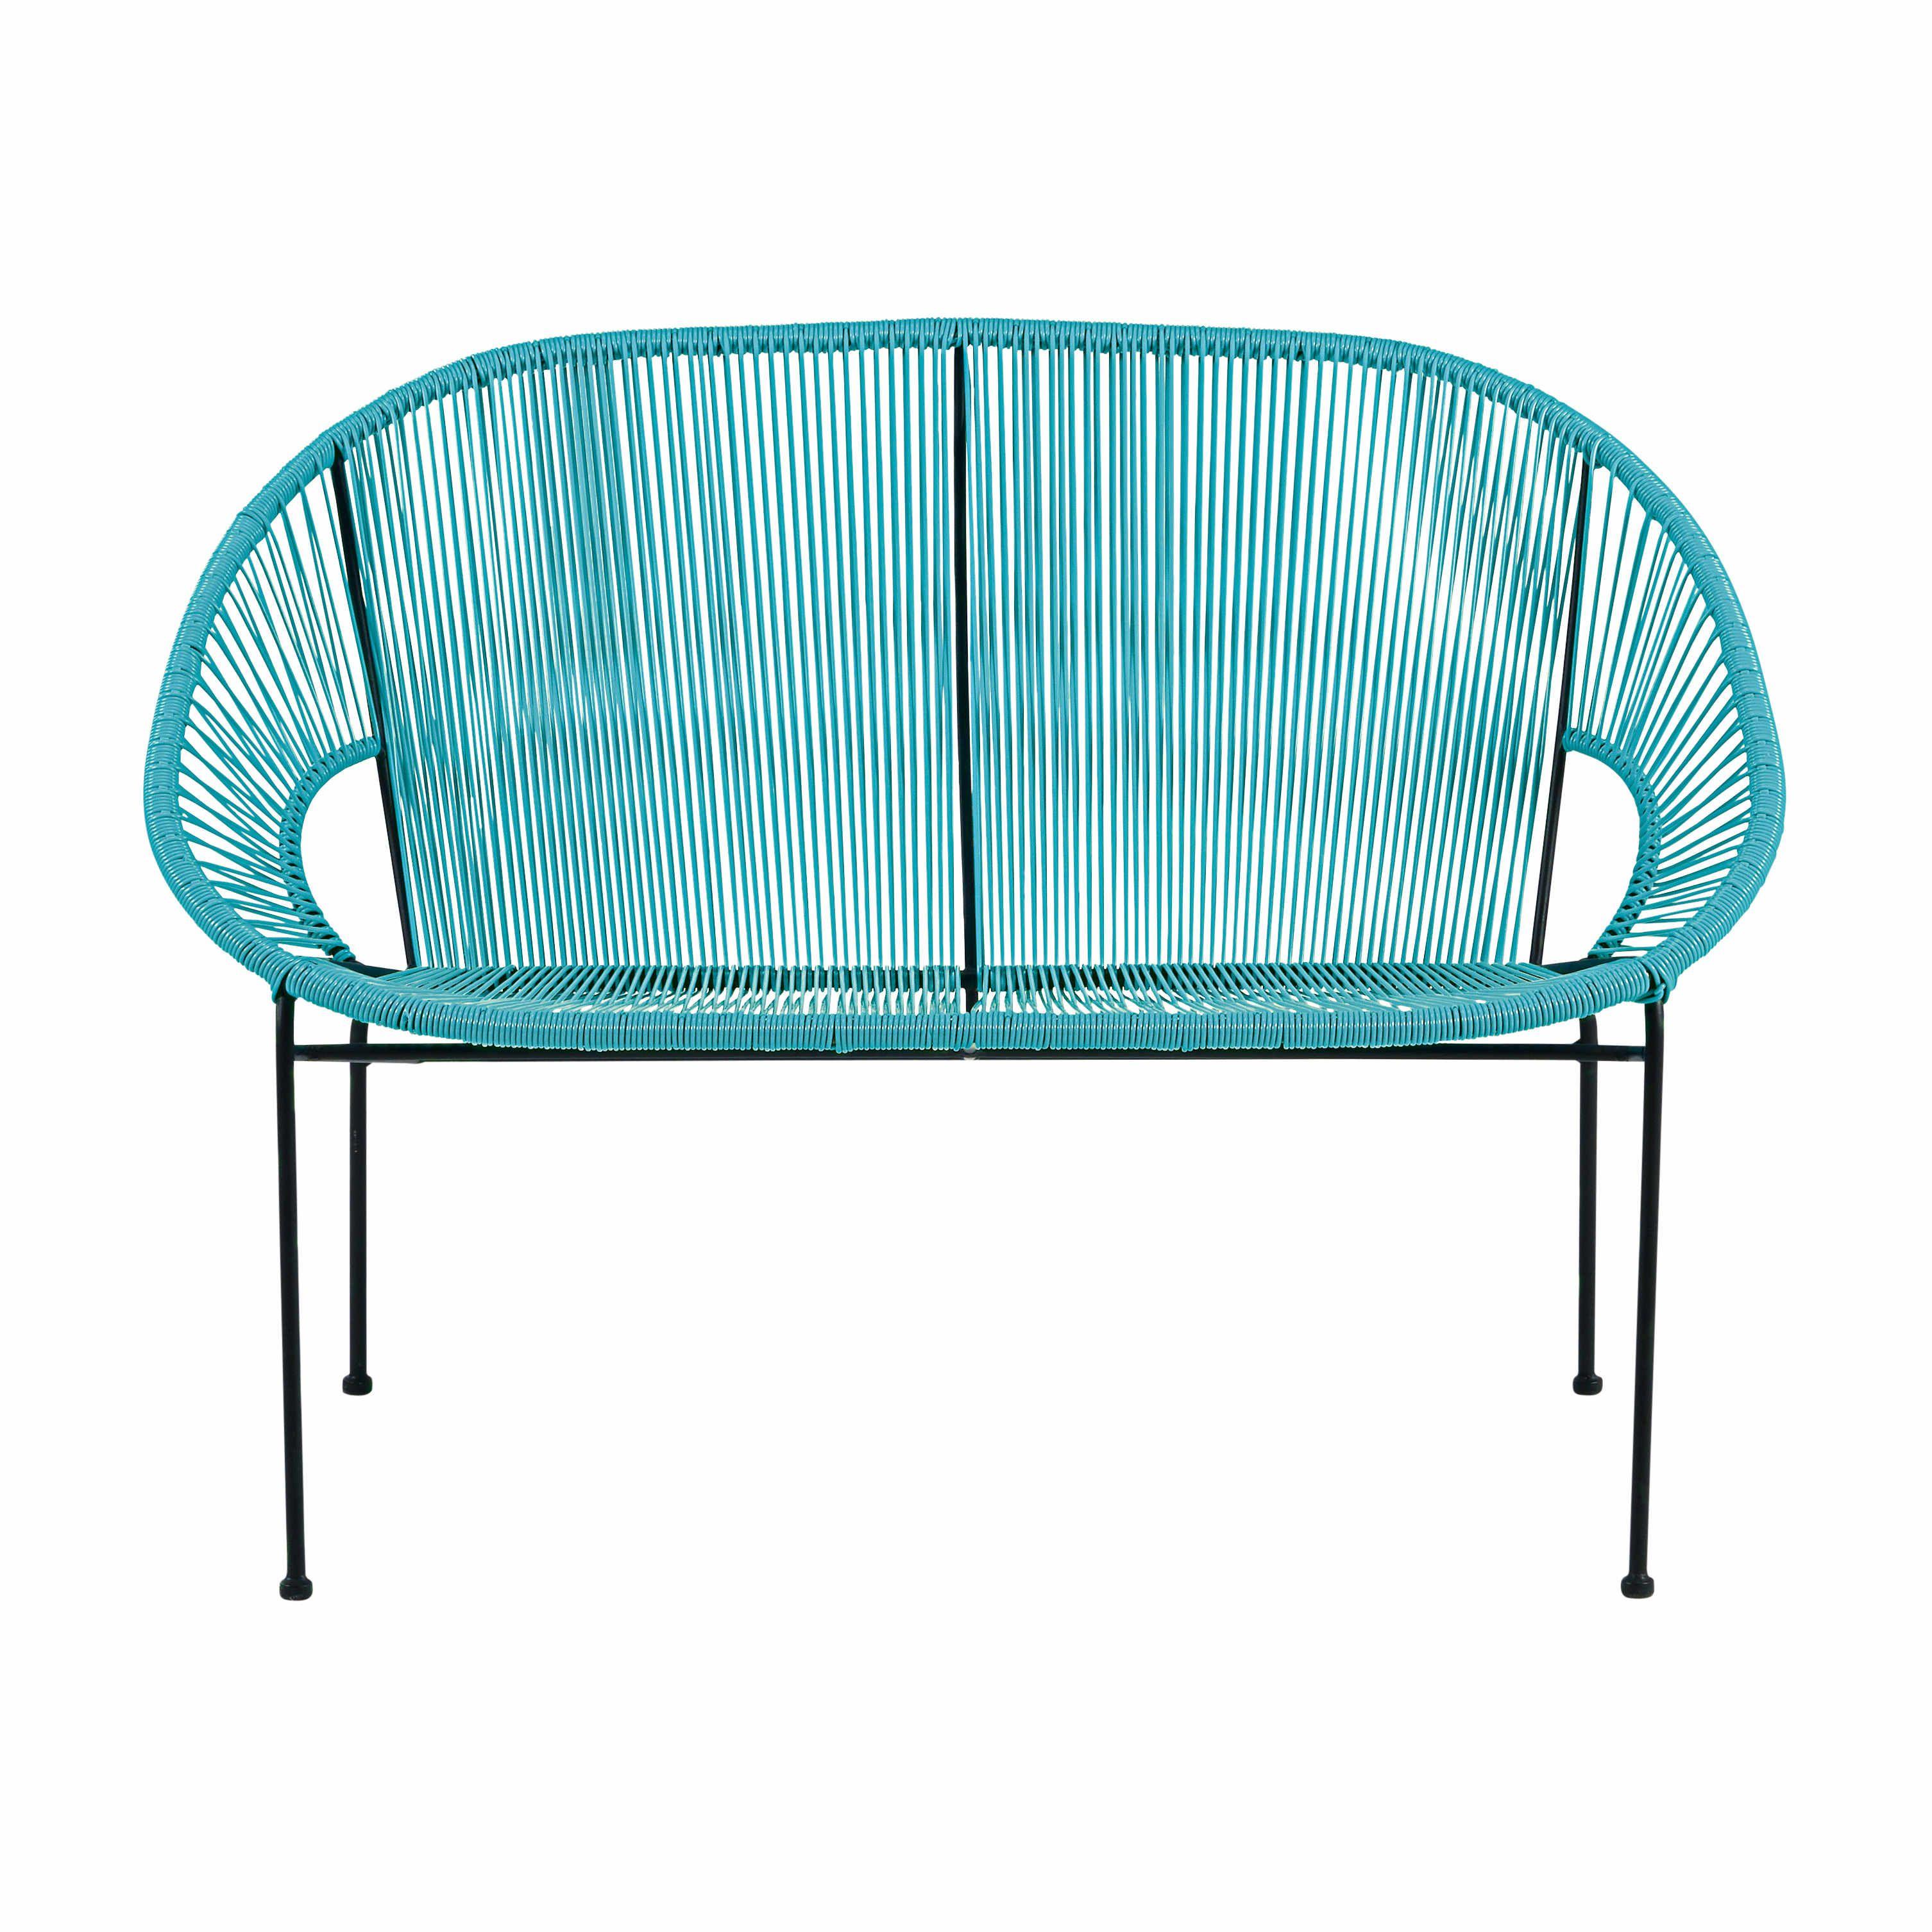 Panche Da Giardino In Resina.Panca Da Giardino 2 3 Posti In Fili Di Resina Blu E Metallo Nero Garden Bench Garden Chairs Design Garden Chairs